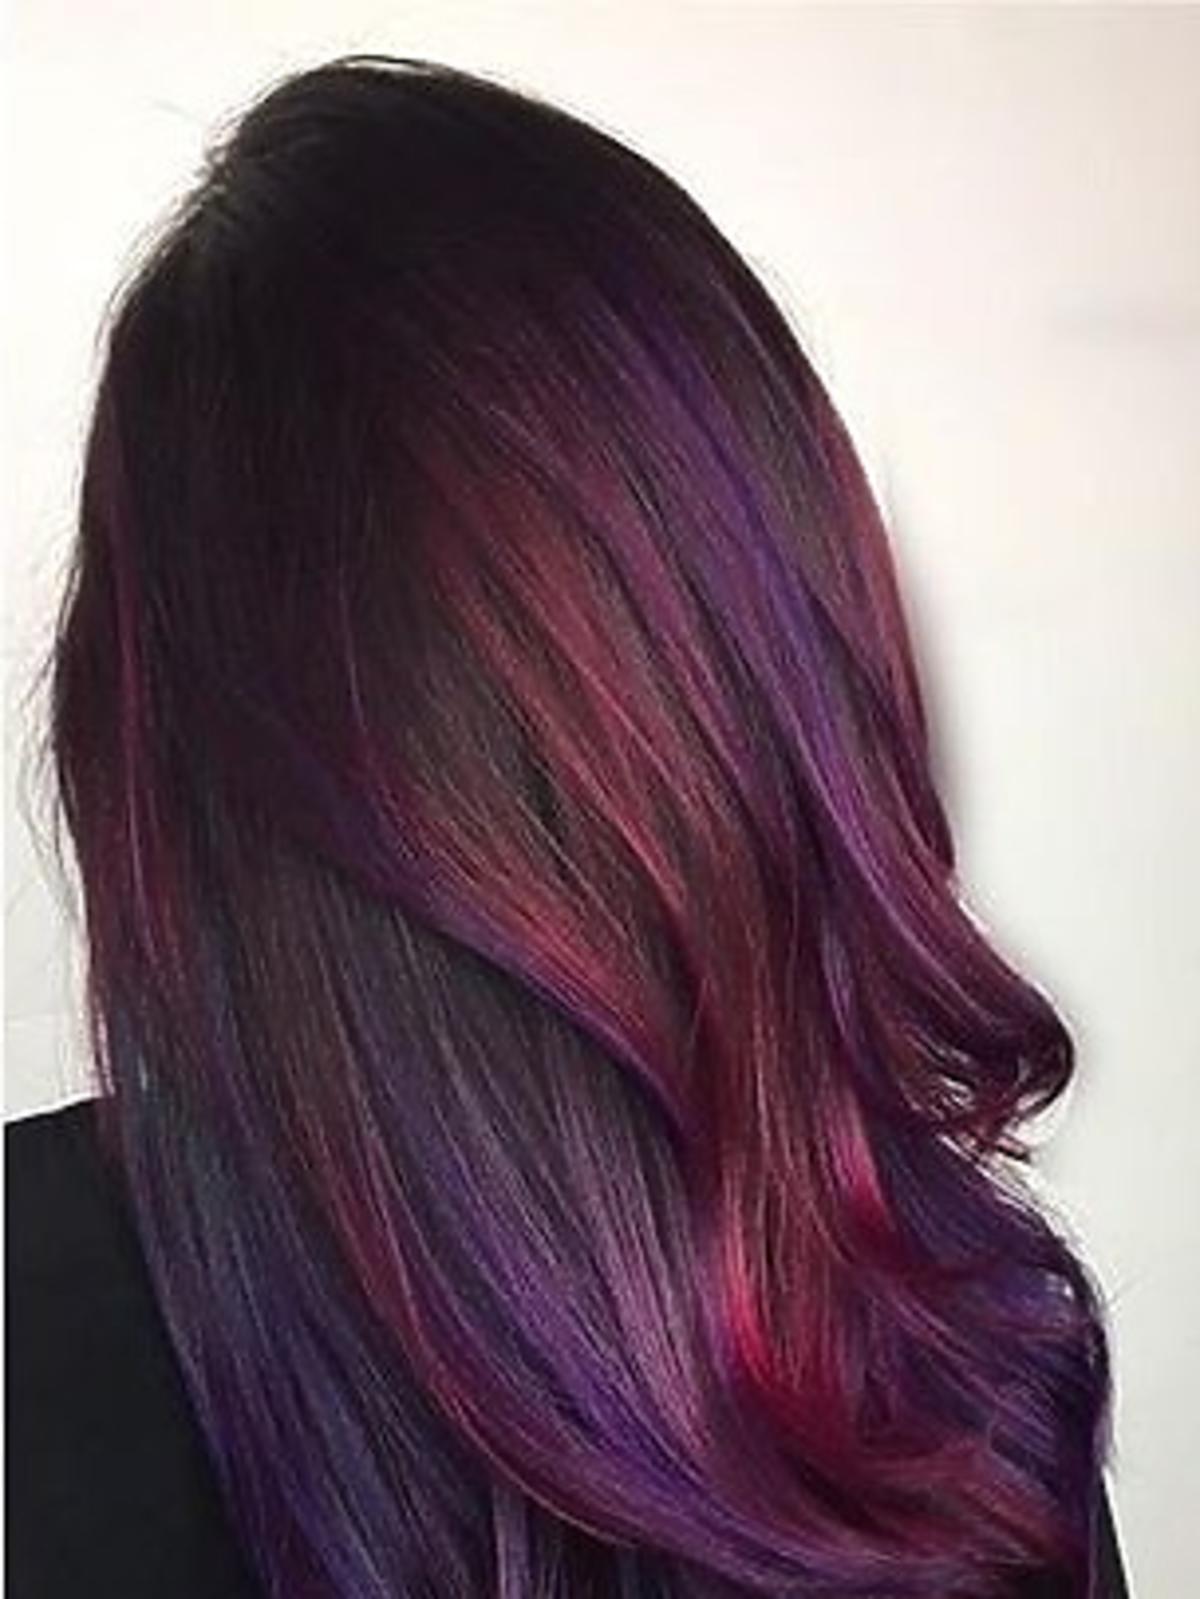 Kolor pagenta na włosach